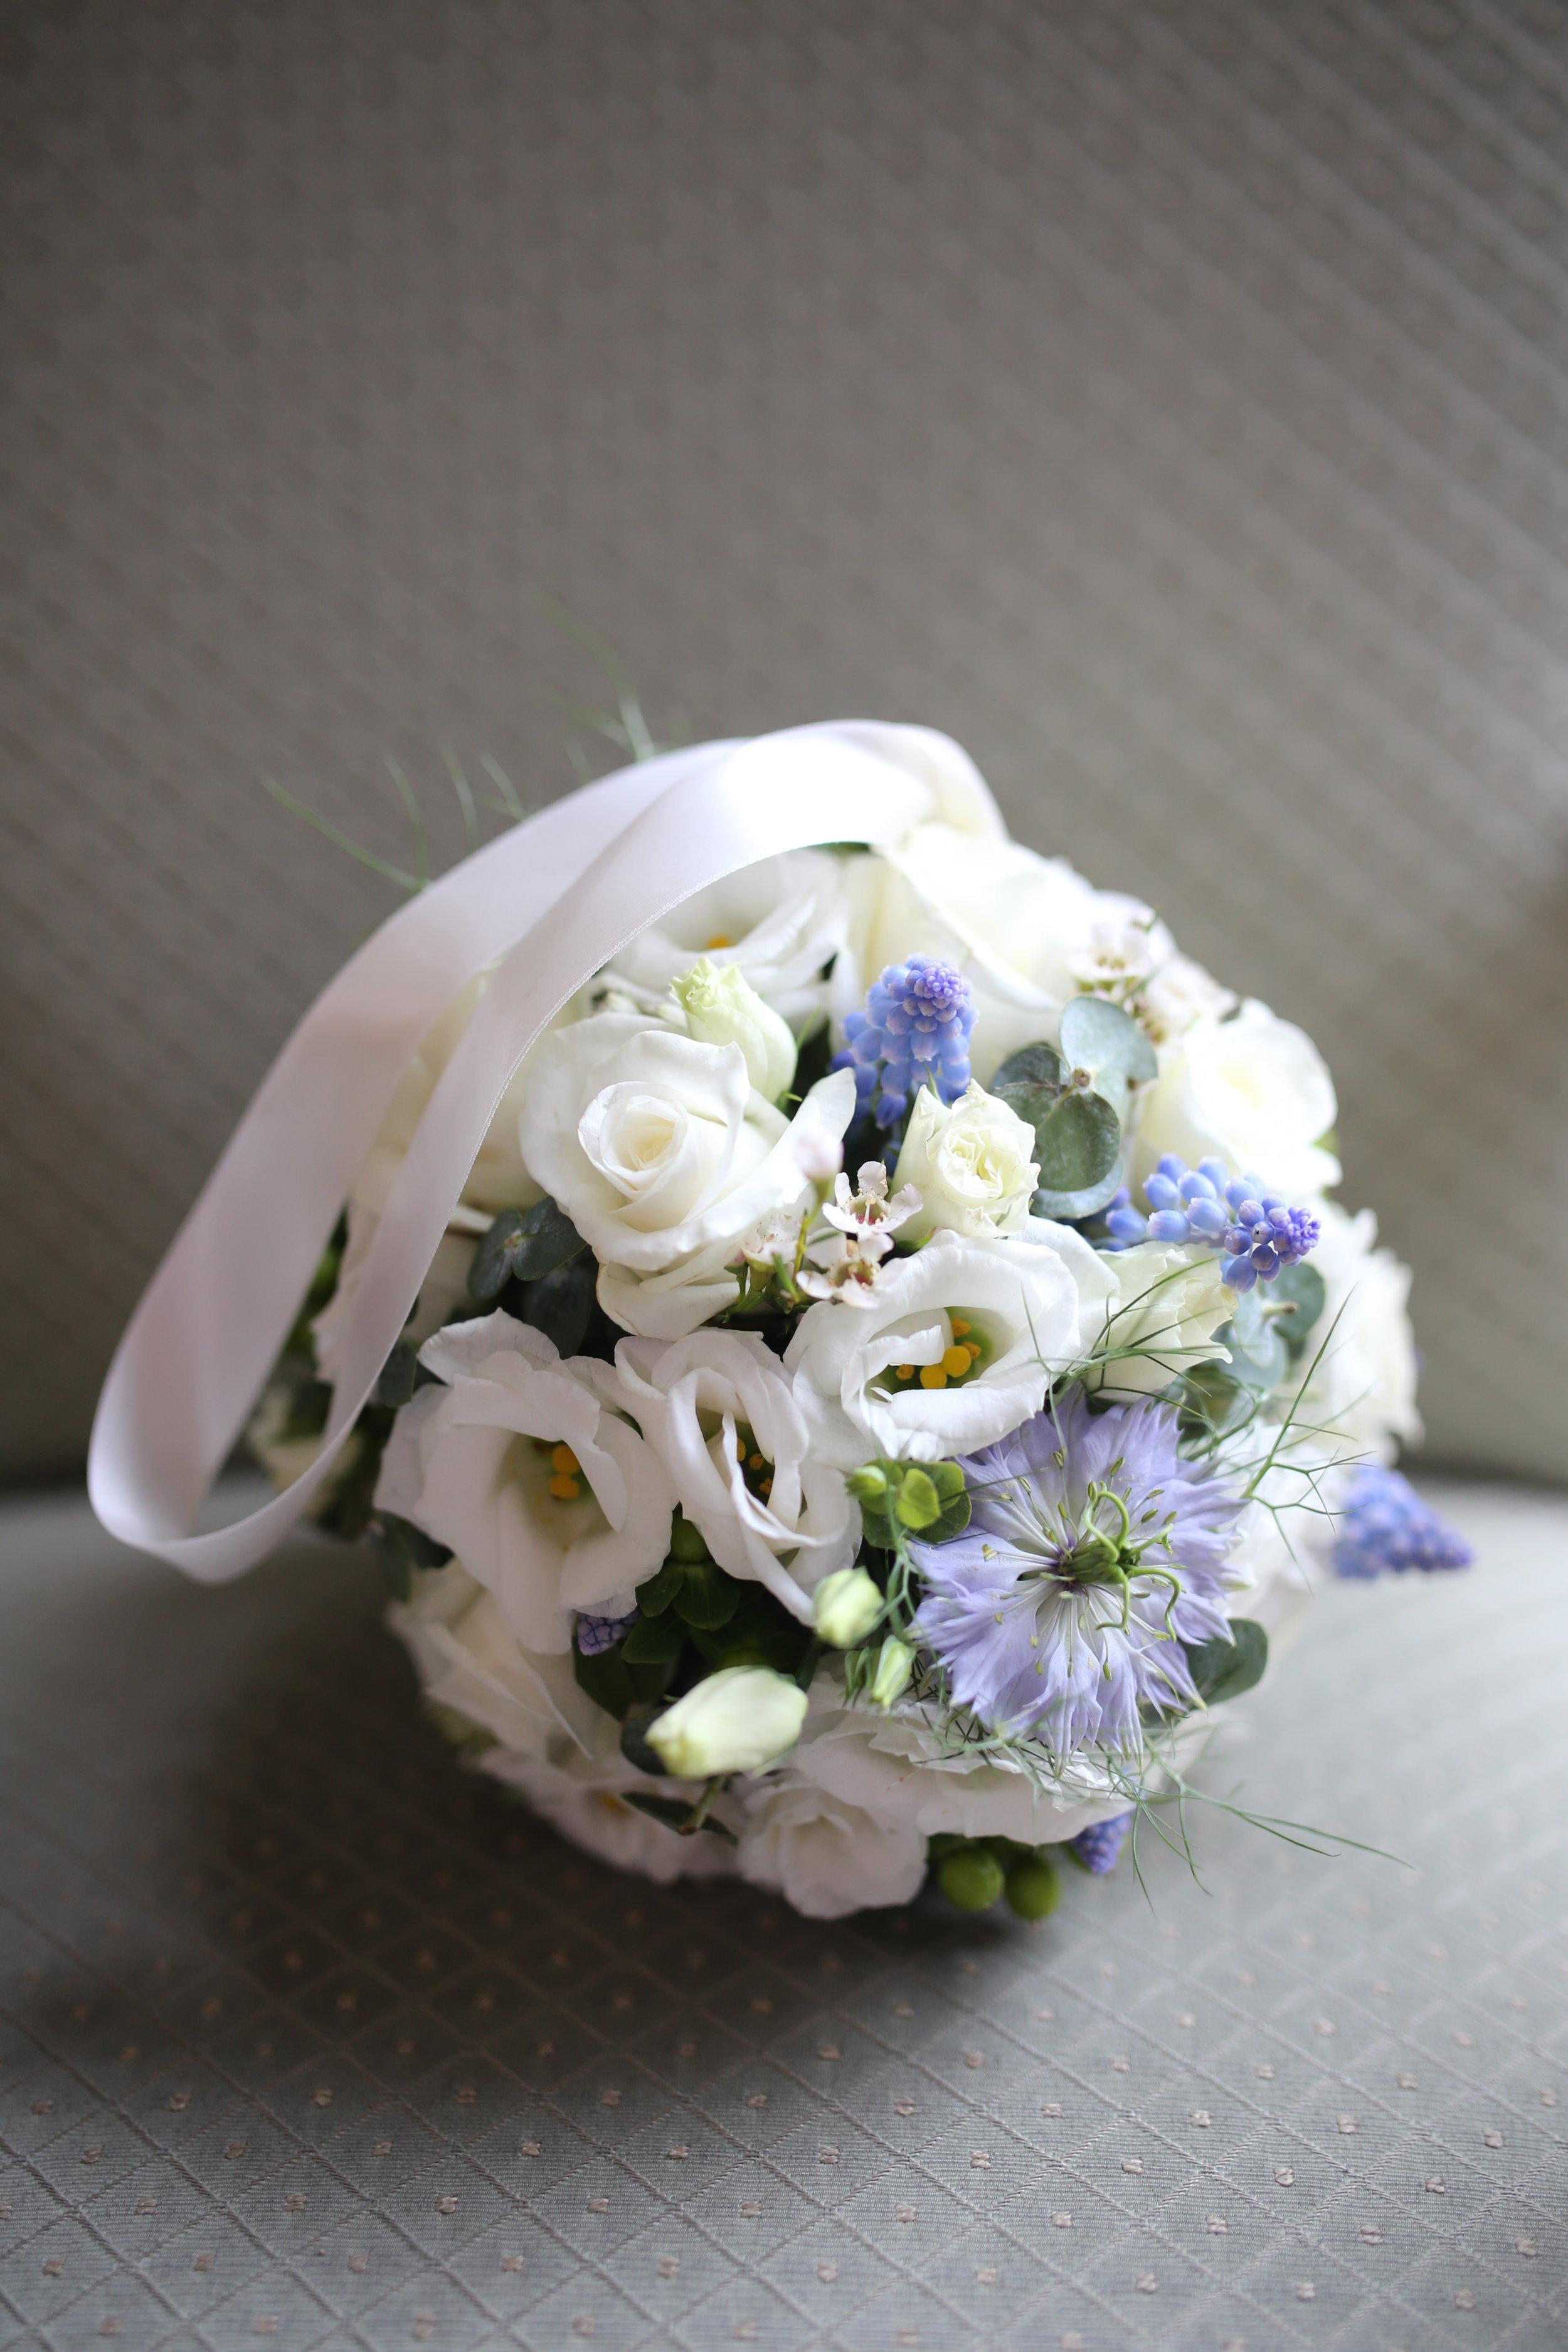 MIRIAM_FAITH_WEDDING_FLOWERS_POMANDER_FLOWERGIRL_WHITE_BLUE.JPG